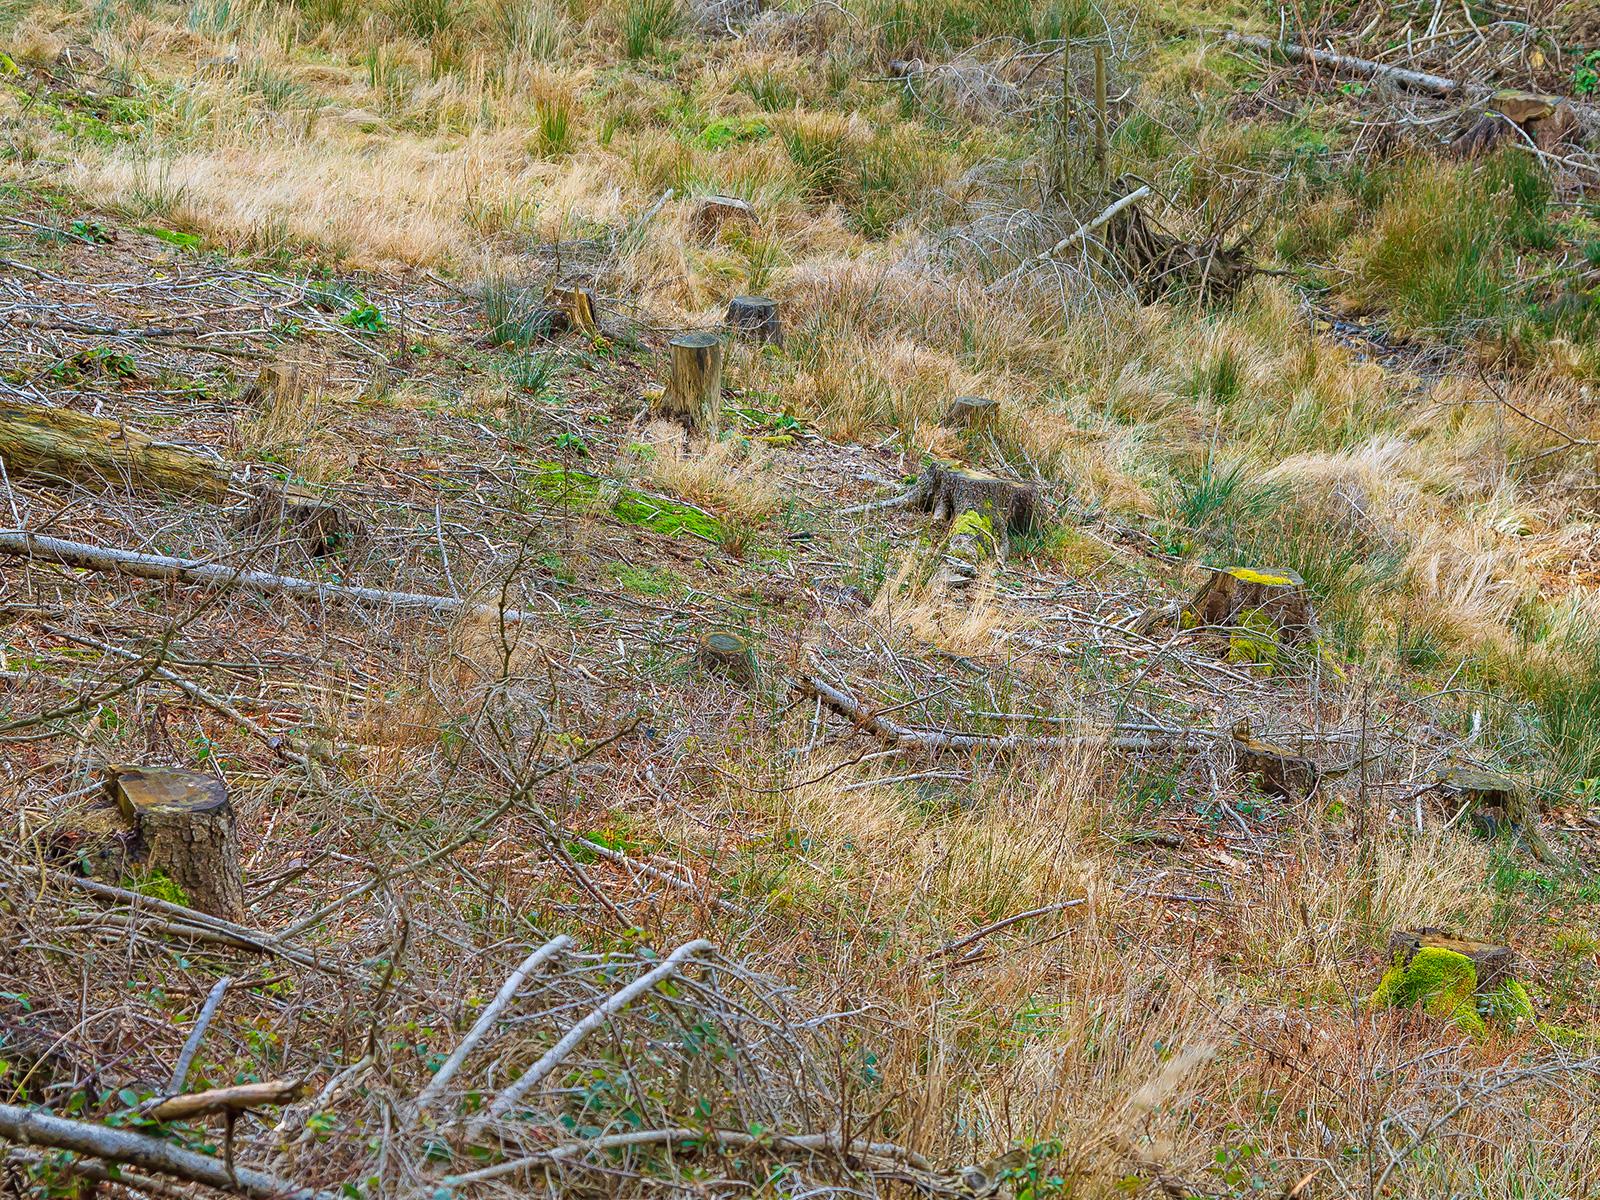 trockener, nährstoffarmer Boden - Lorbach rechts oben im Bild